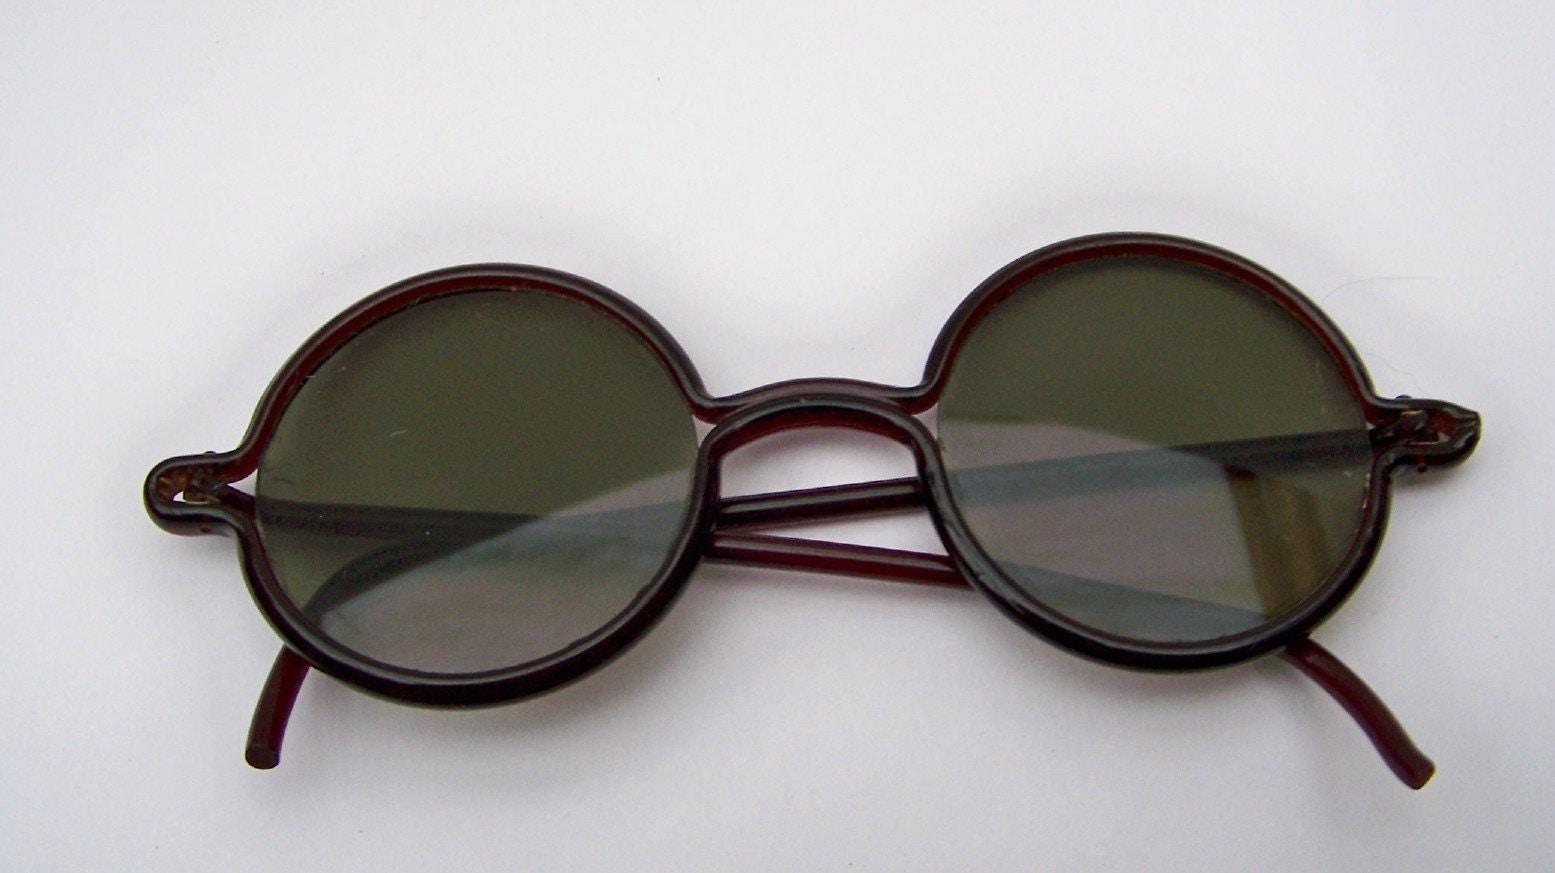 1920s sunglasses